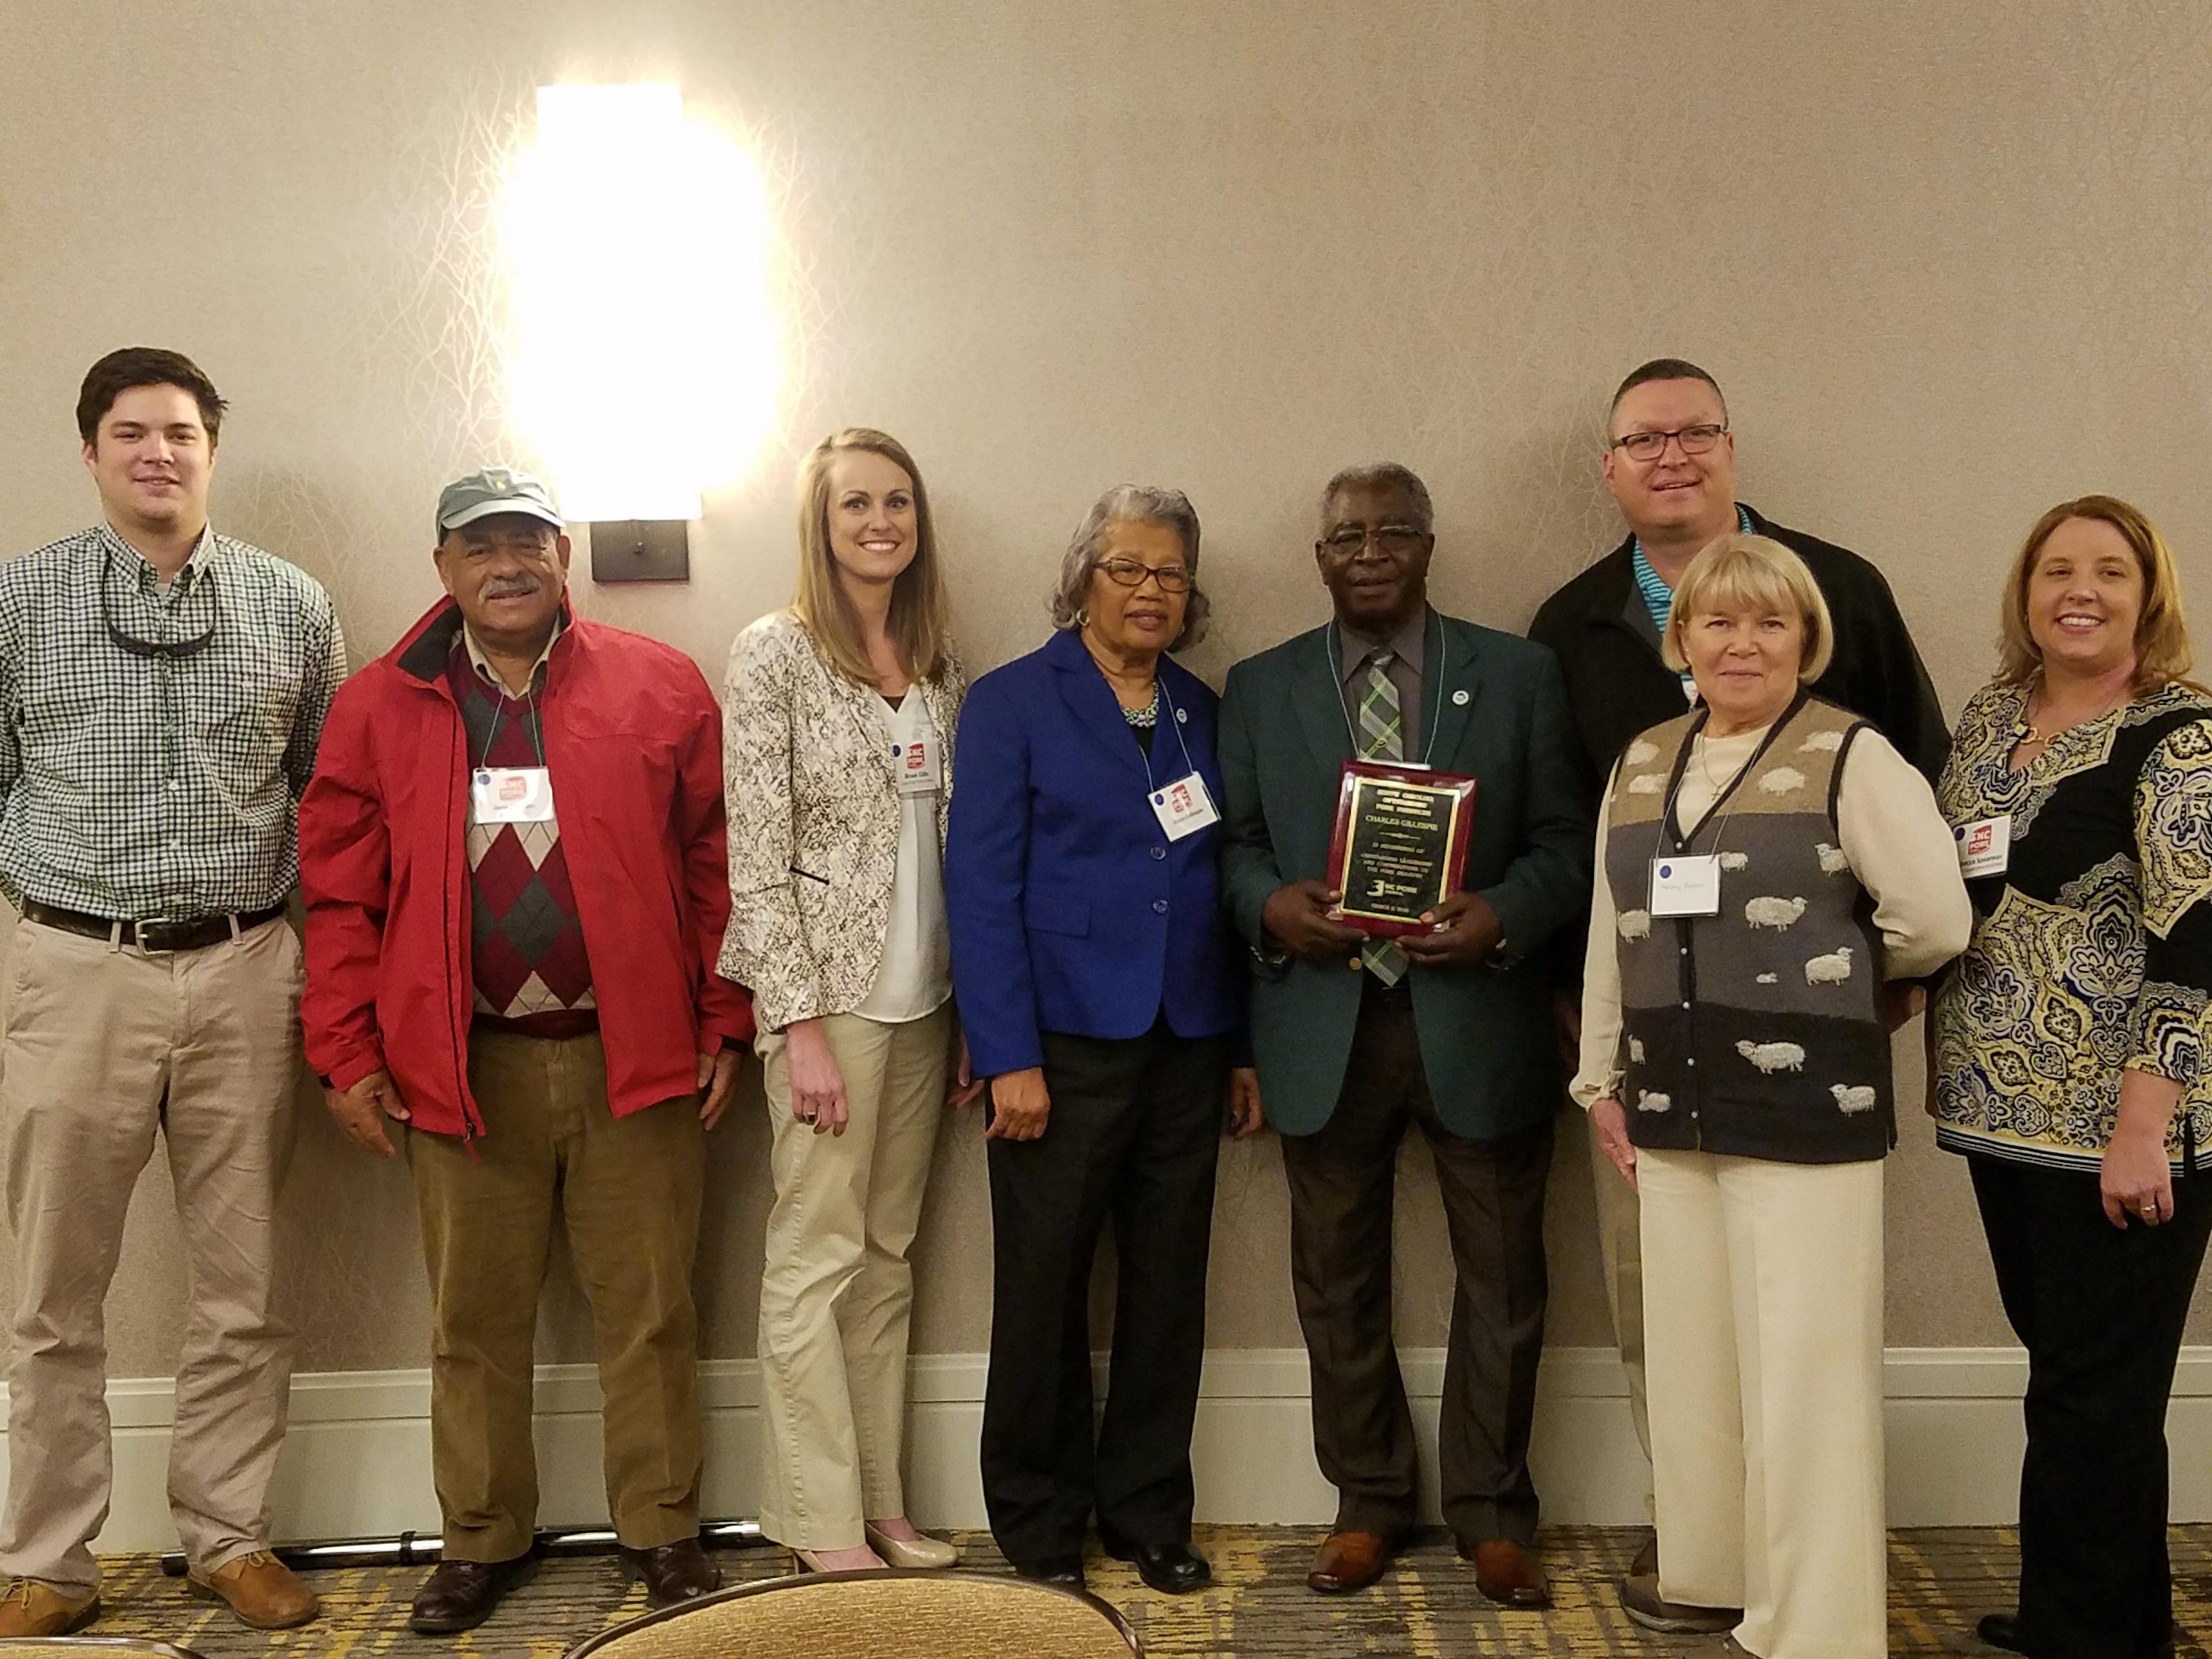 Bladen family farm earns recognition